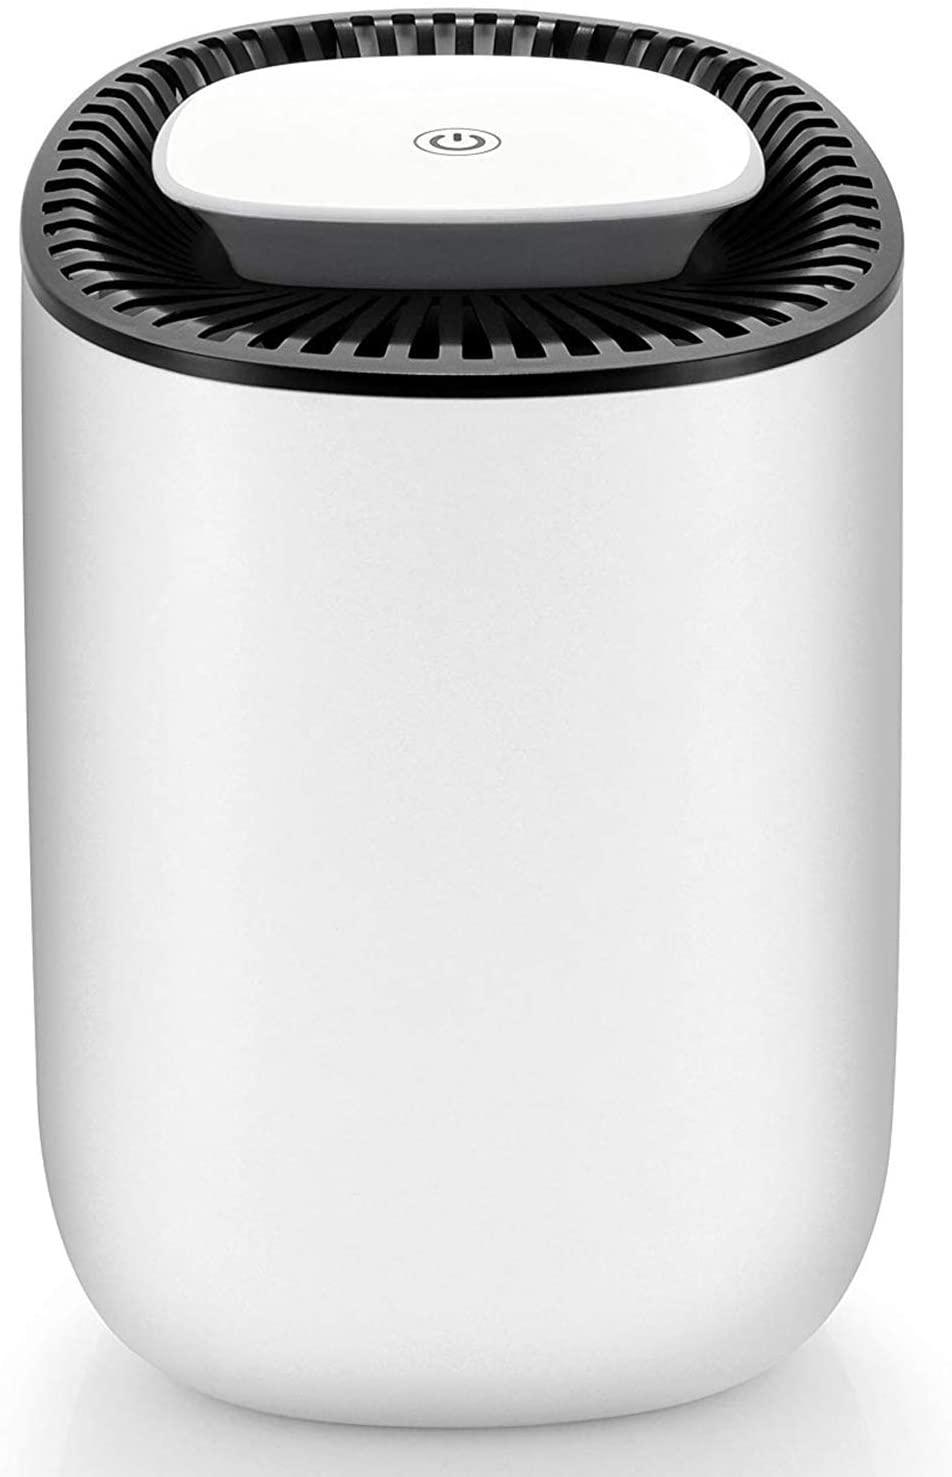 hysure Quiet and Portable Dehumidifier Electric, Crawl Space, Bedroom, RV, Baby Room (600ml)